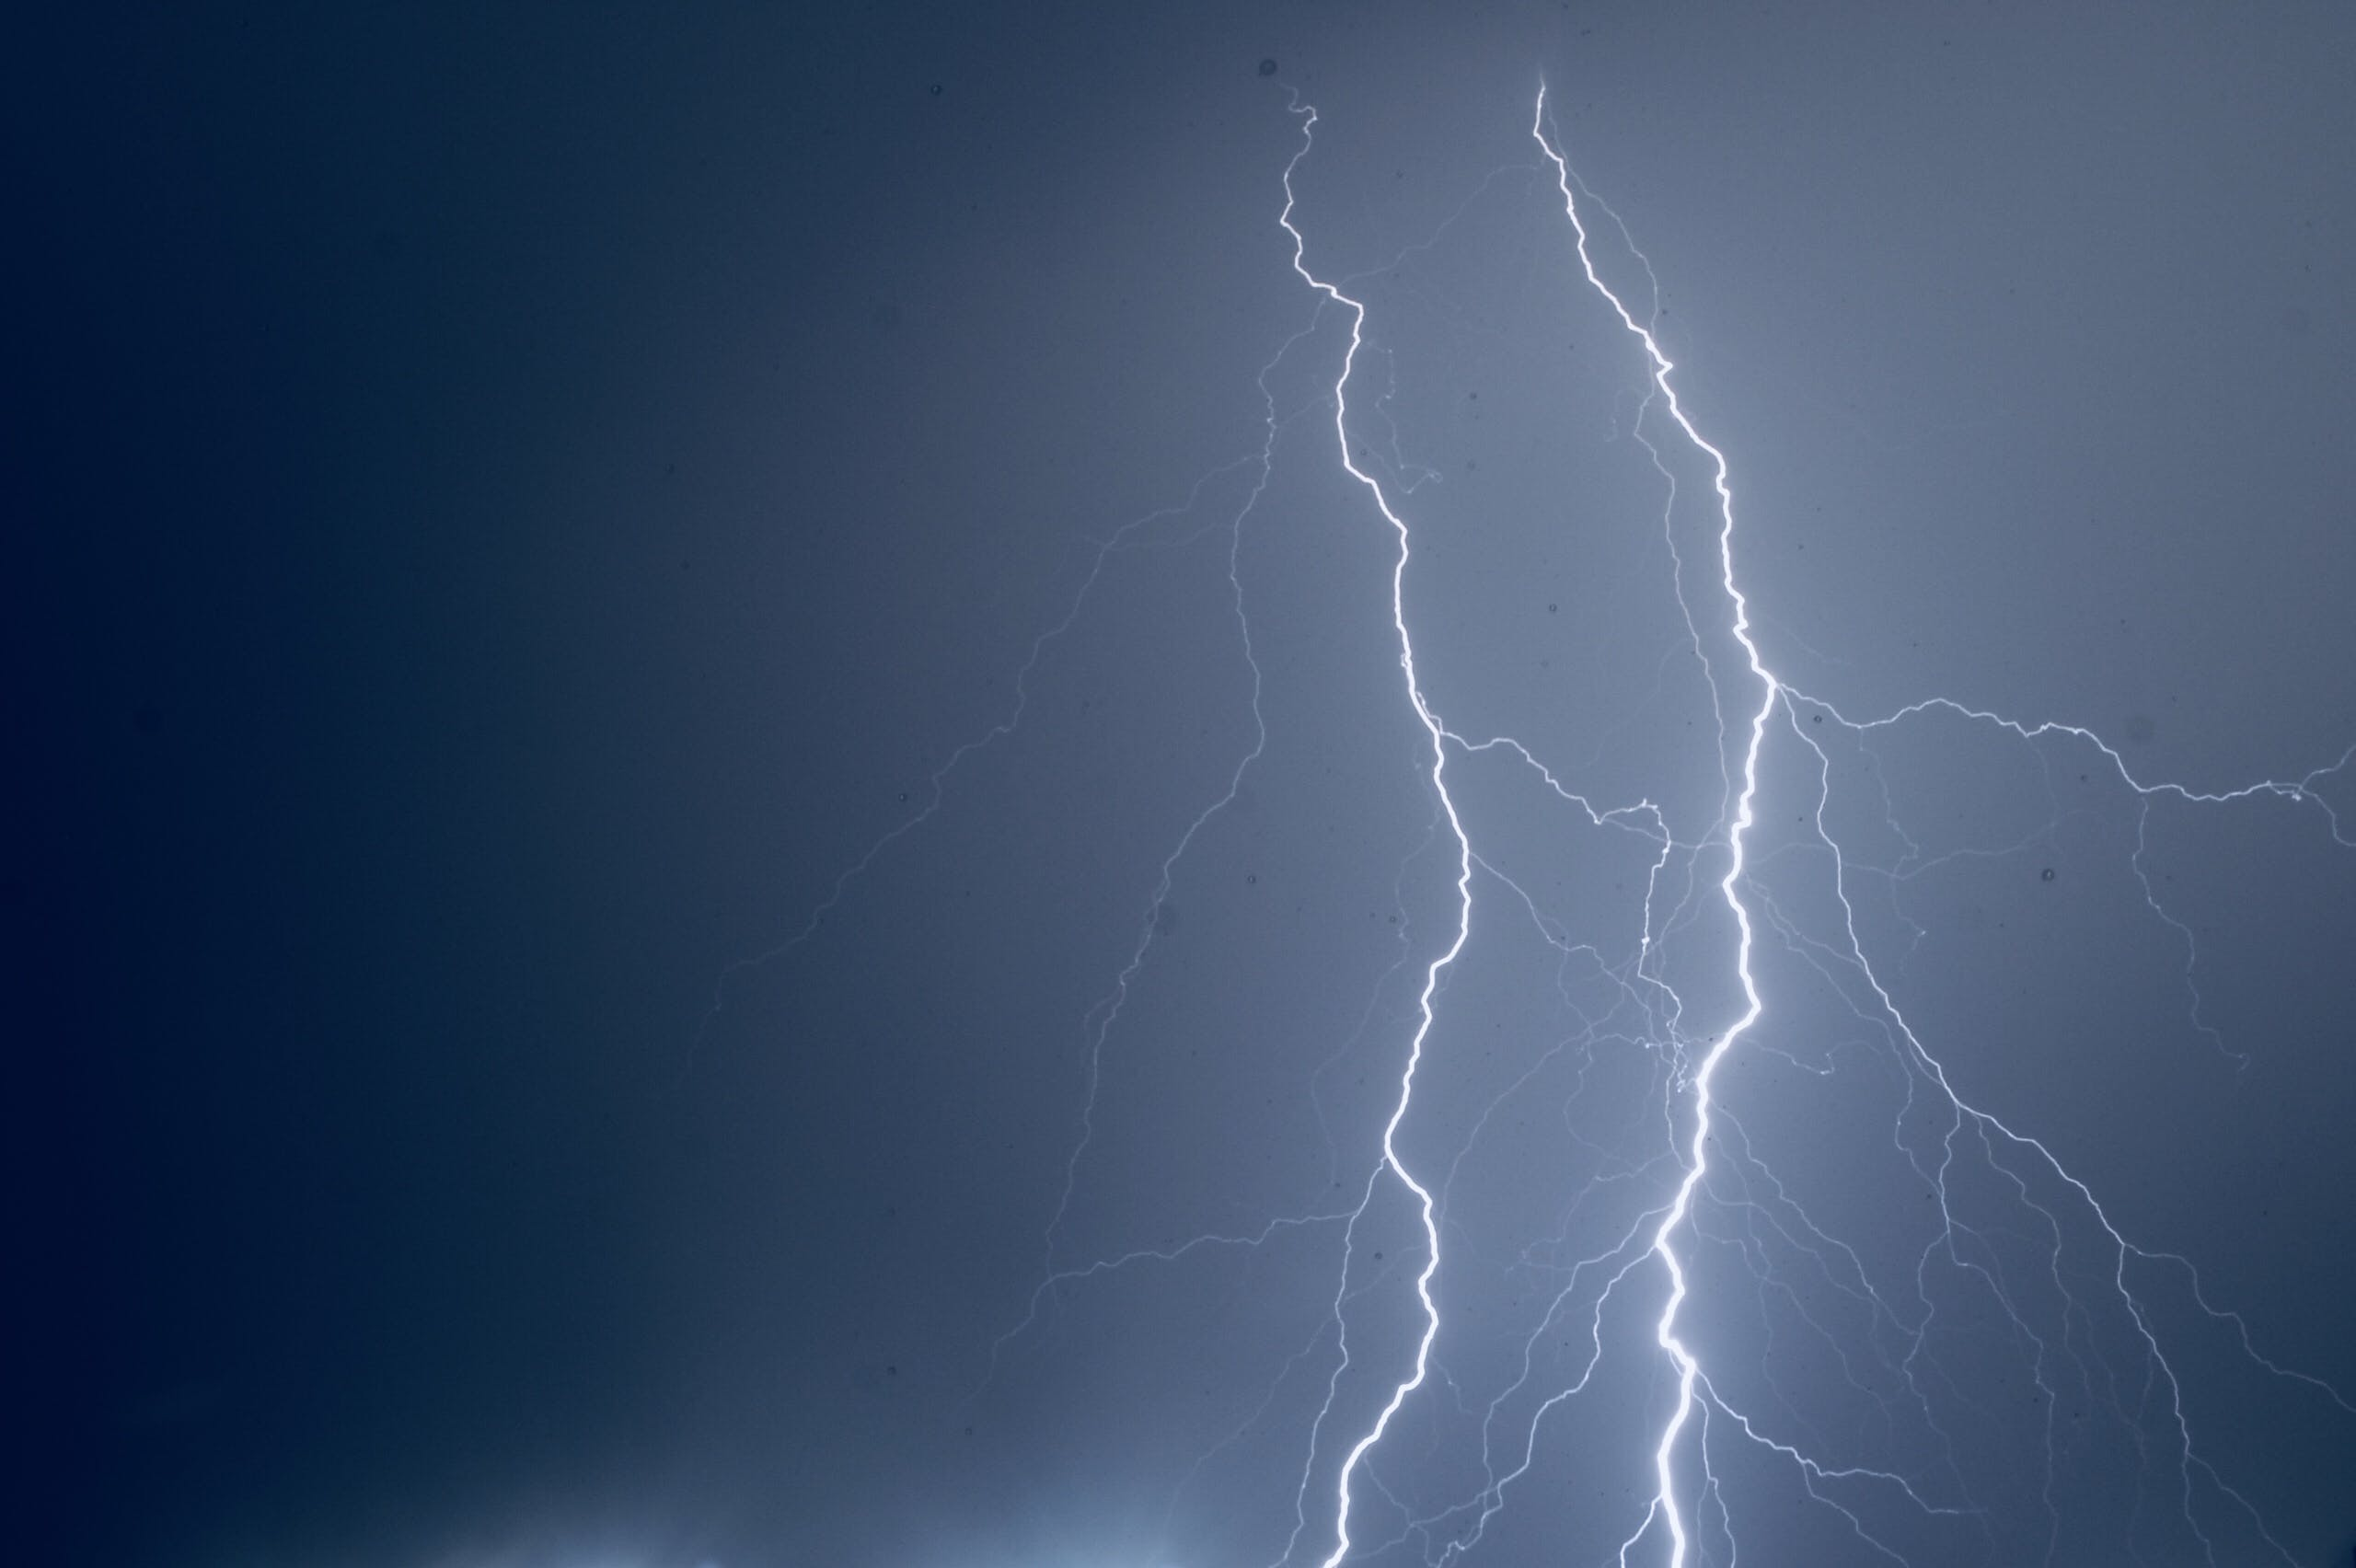 Free stock photo of night life, thunder